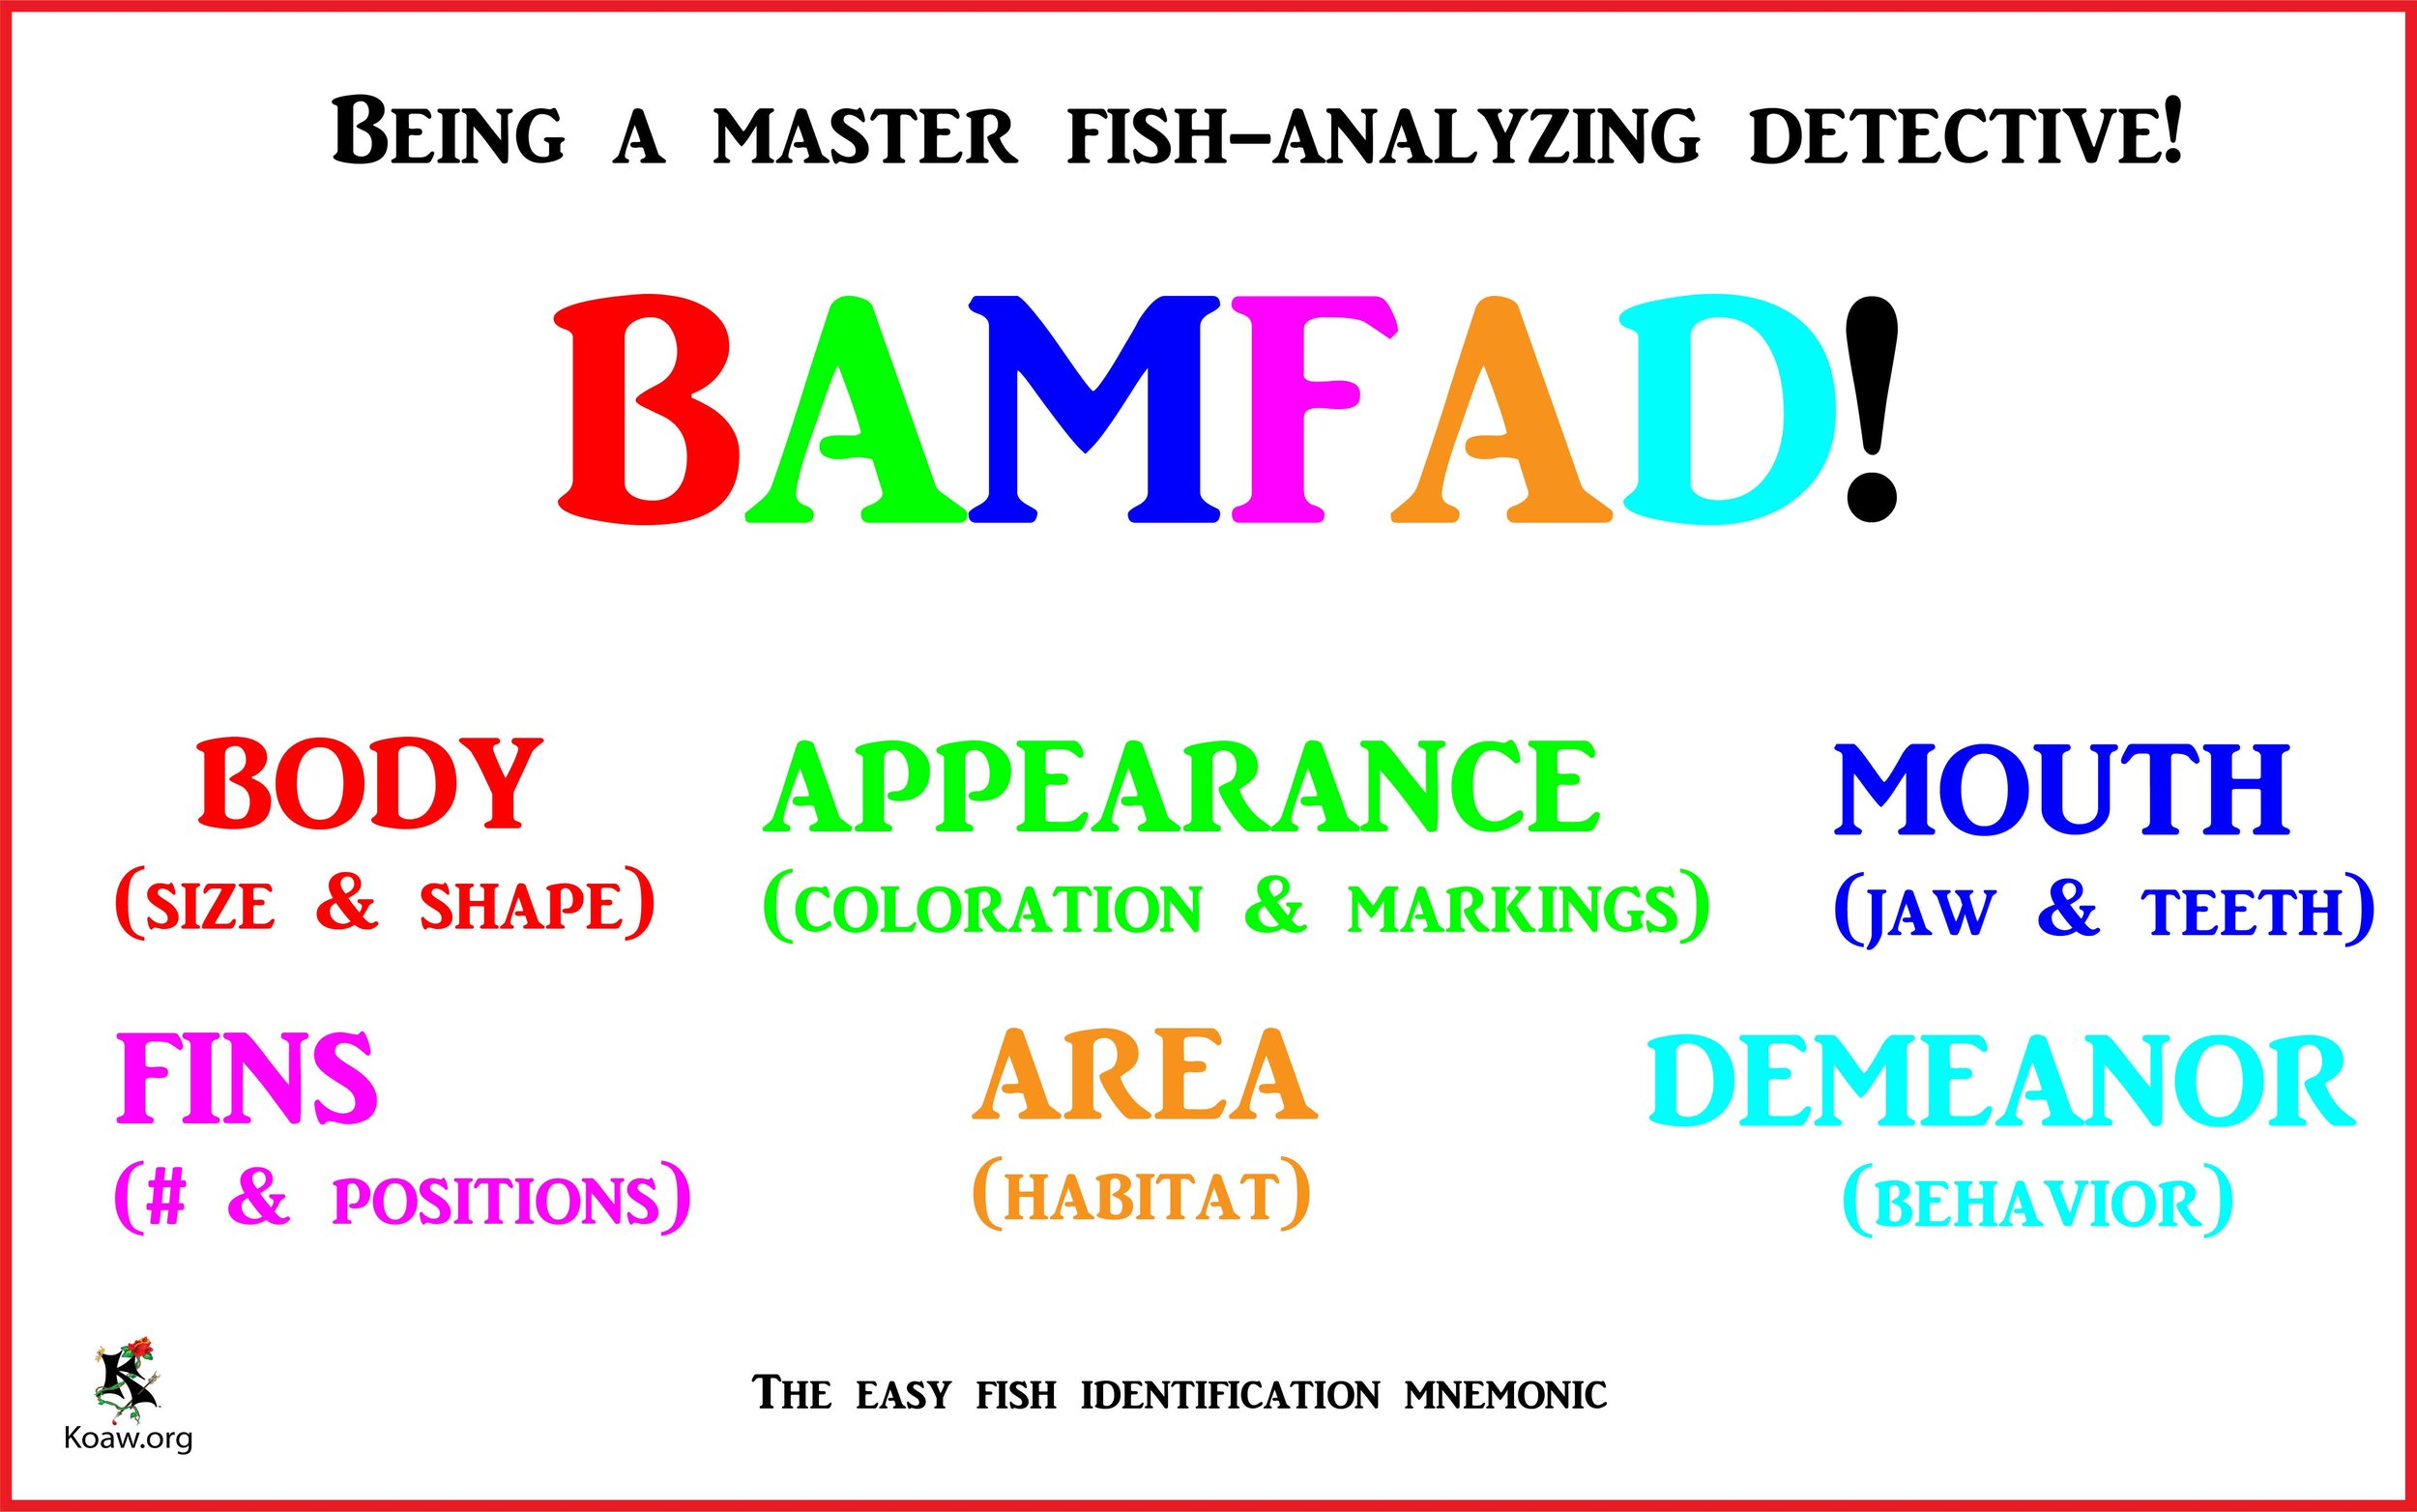 BAMFAD Being a master fish-analyzing detective! - by Koaw